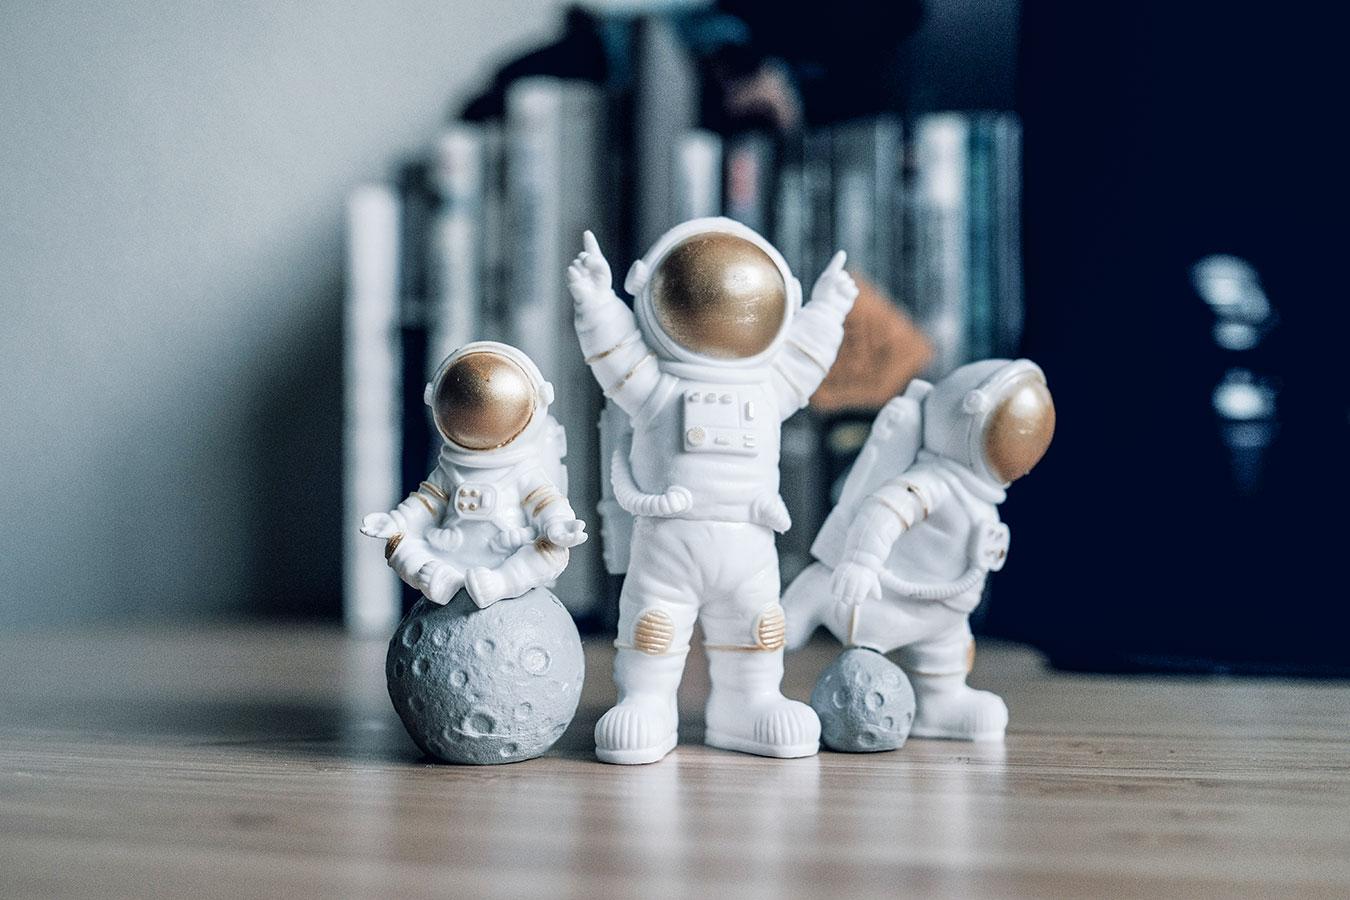 h-ferencz-orsolya-astronauts.jpg